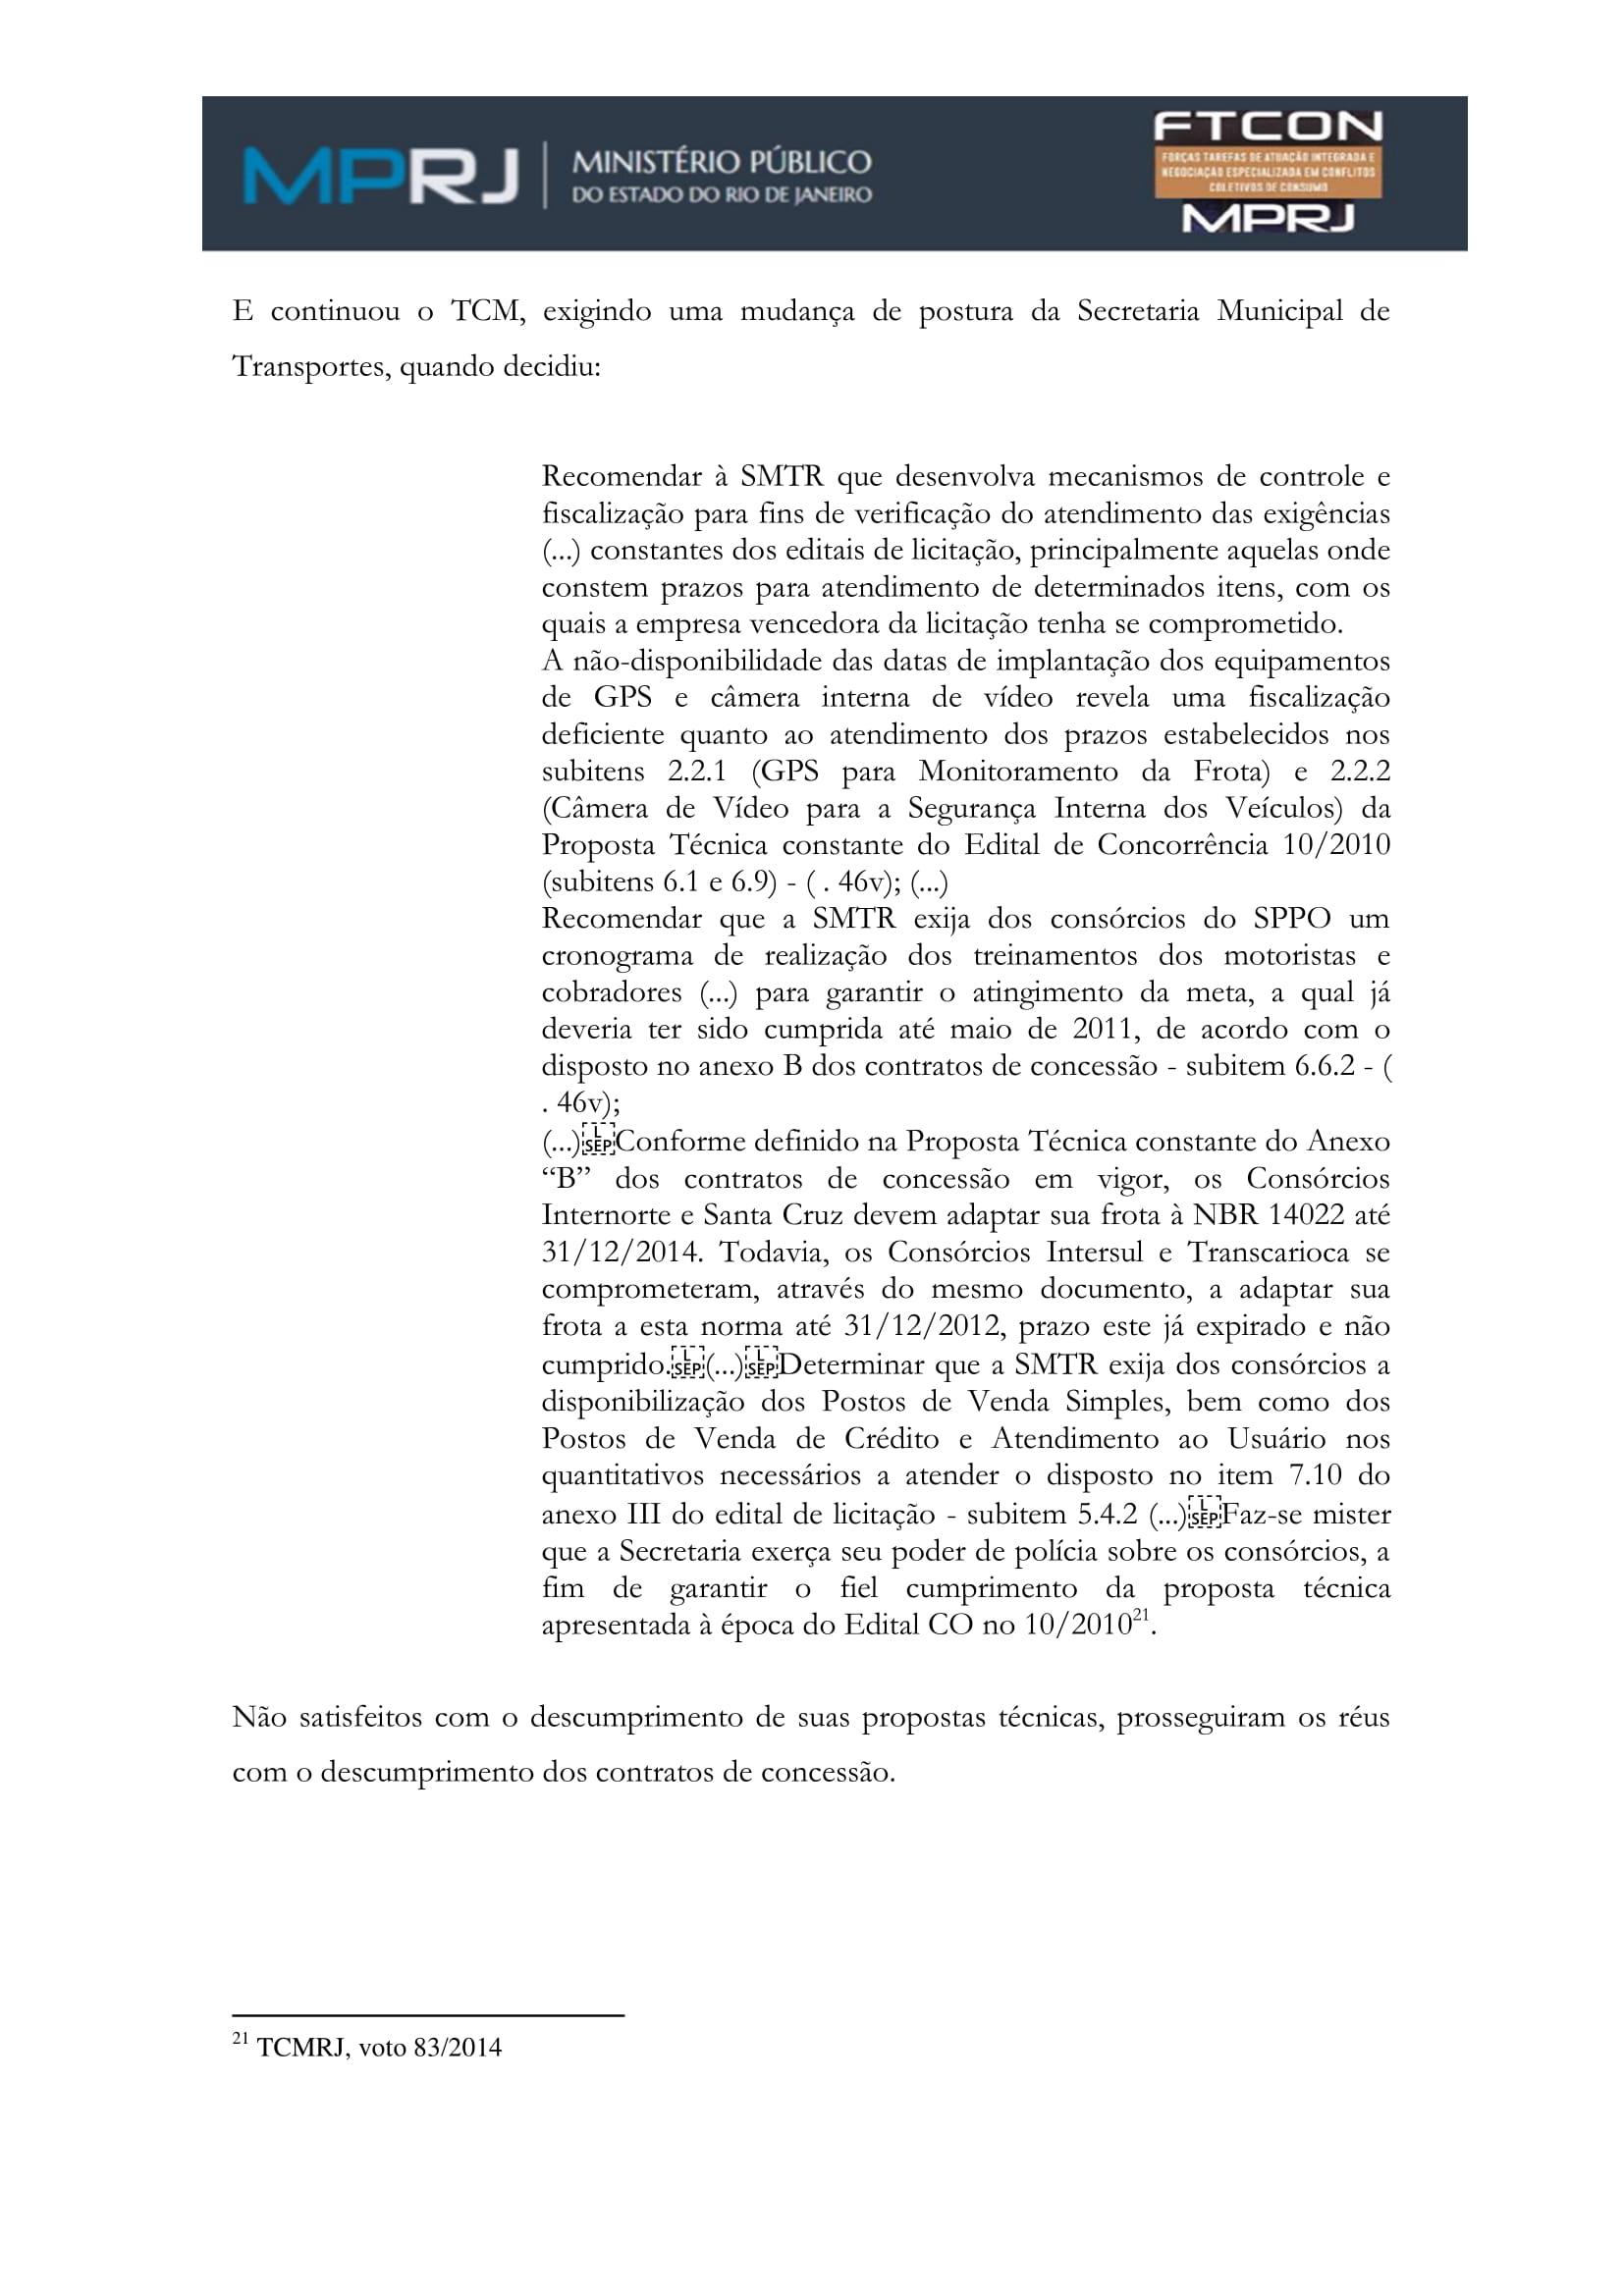 acp_caducidade_onibus_dr_rt-021